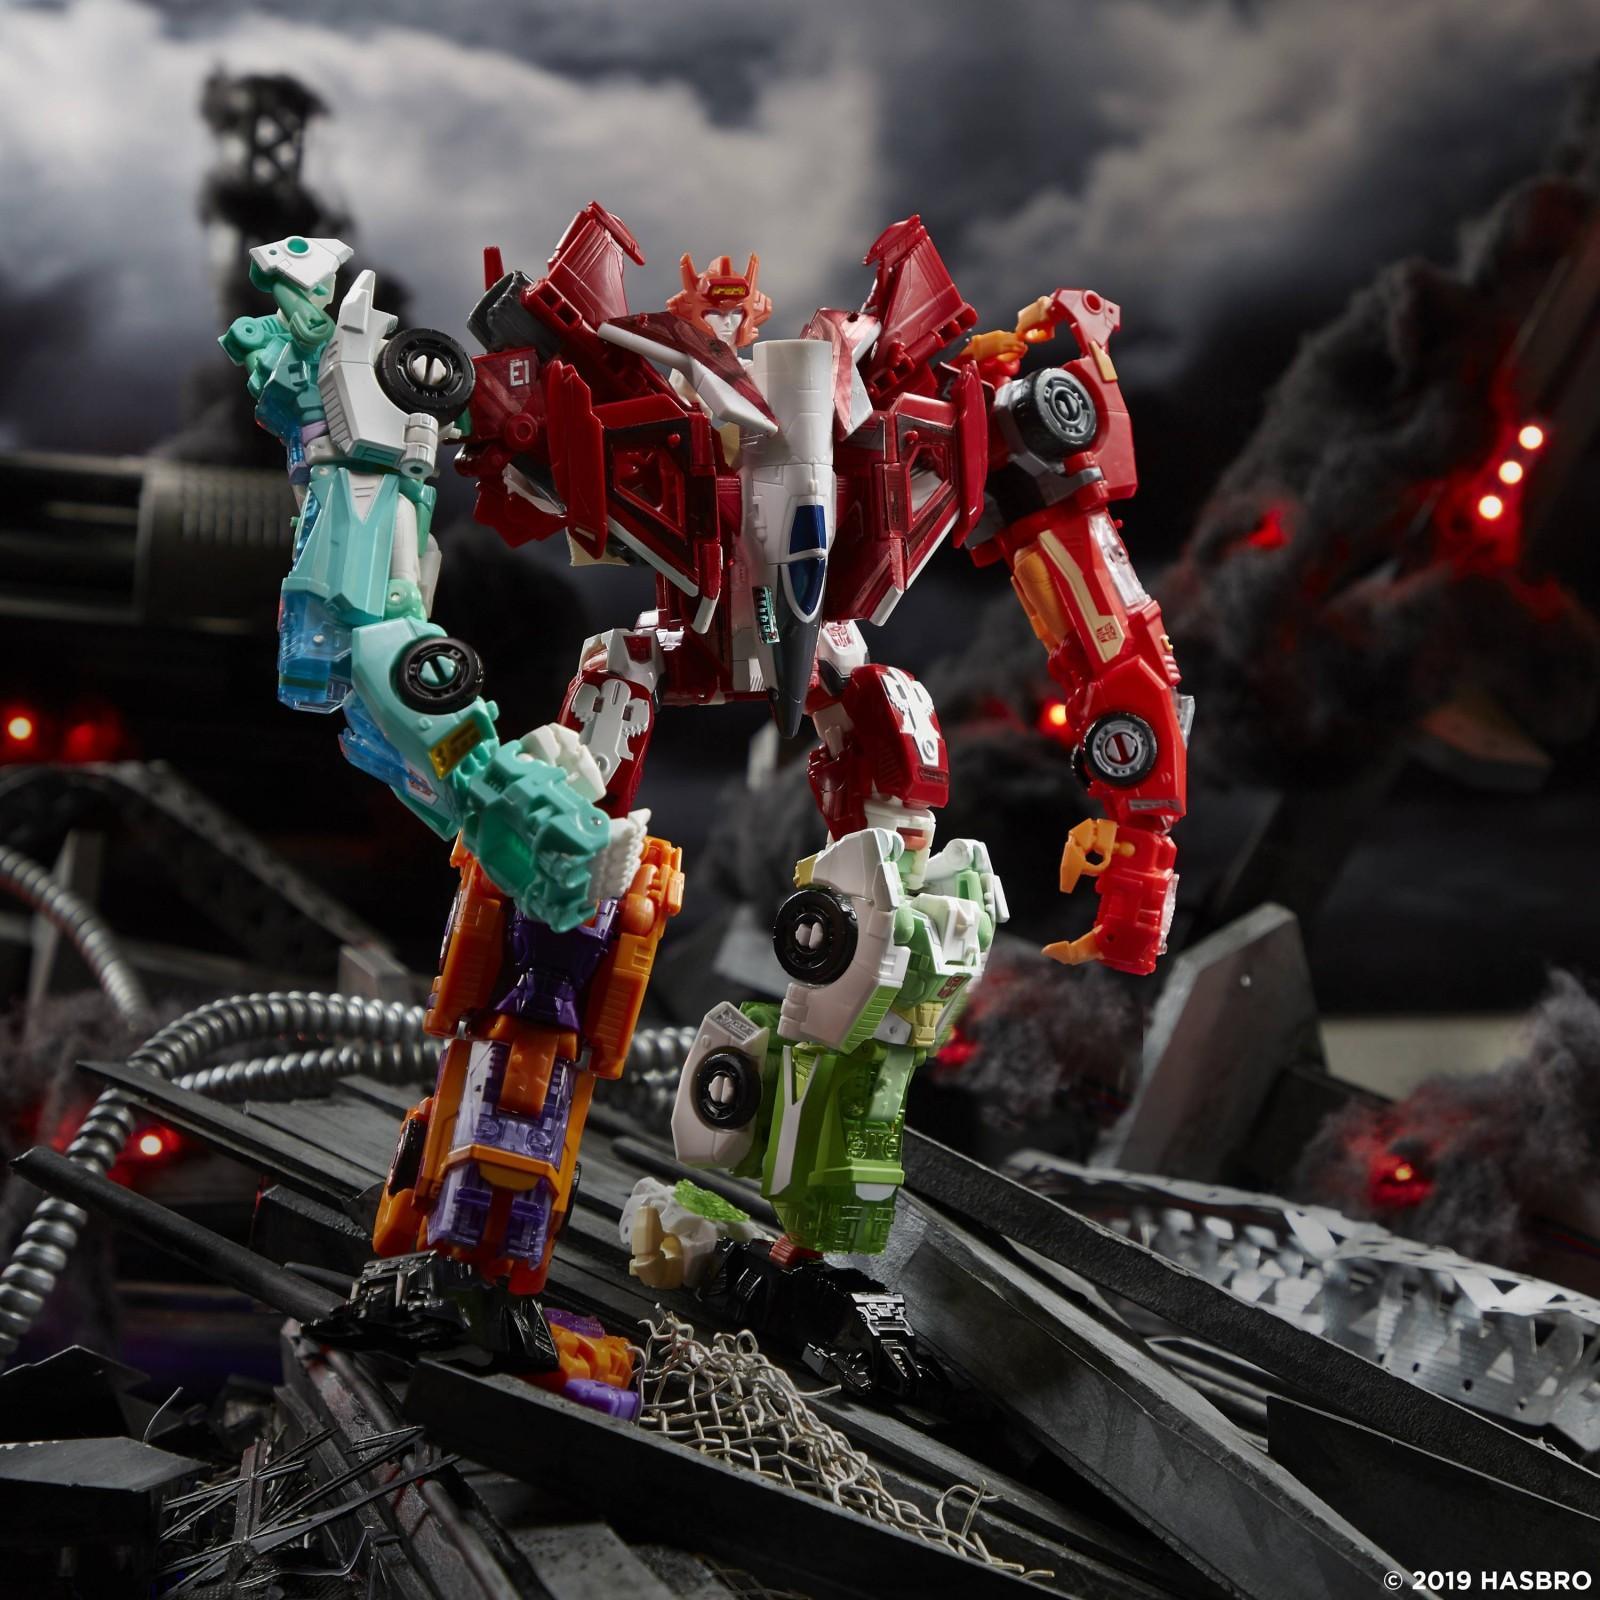 Transformers News: Re: Orthia (Elitia-1finate) story and pics put up on hasbropulse.com